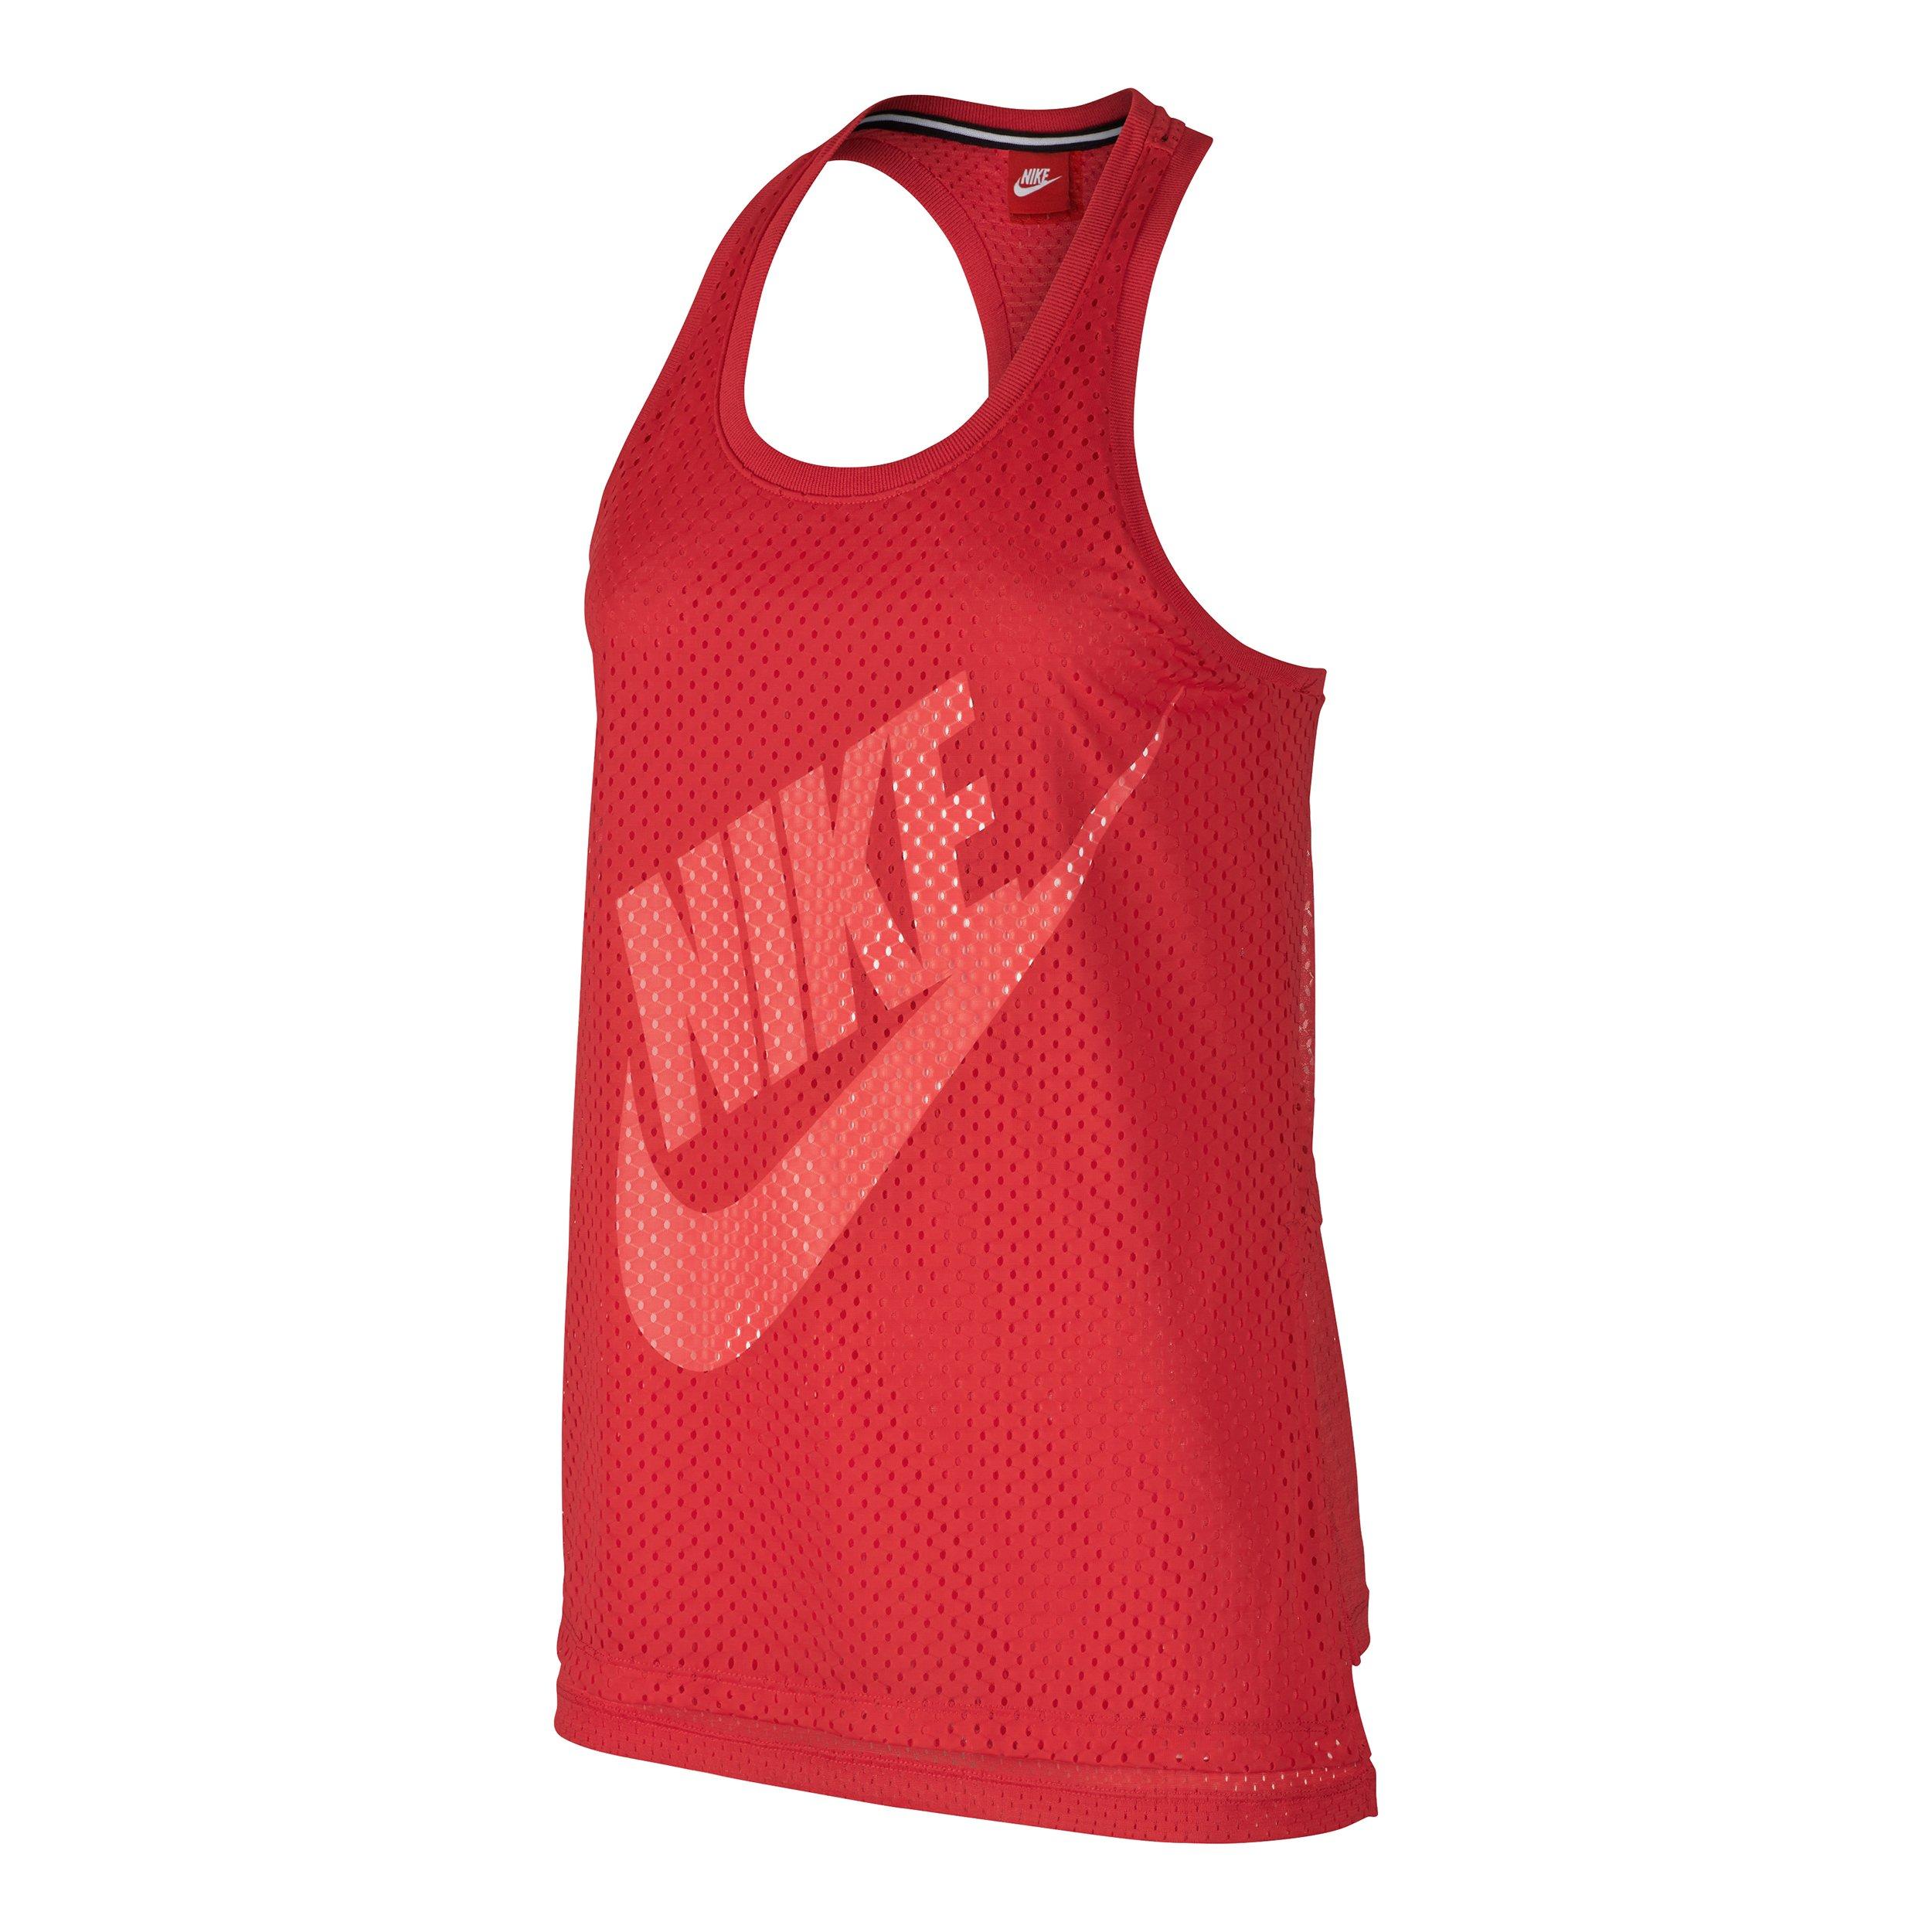 Nike Mesh Sleeveless Tank Top (Womens) (L, Red)